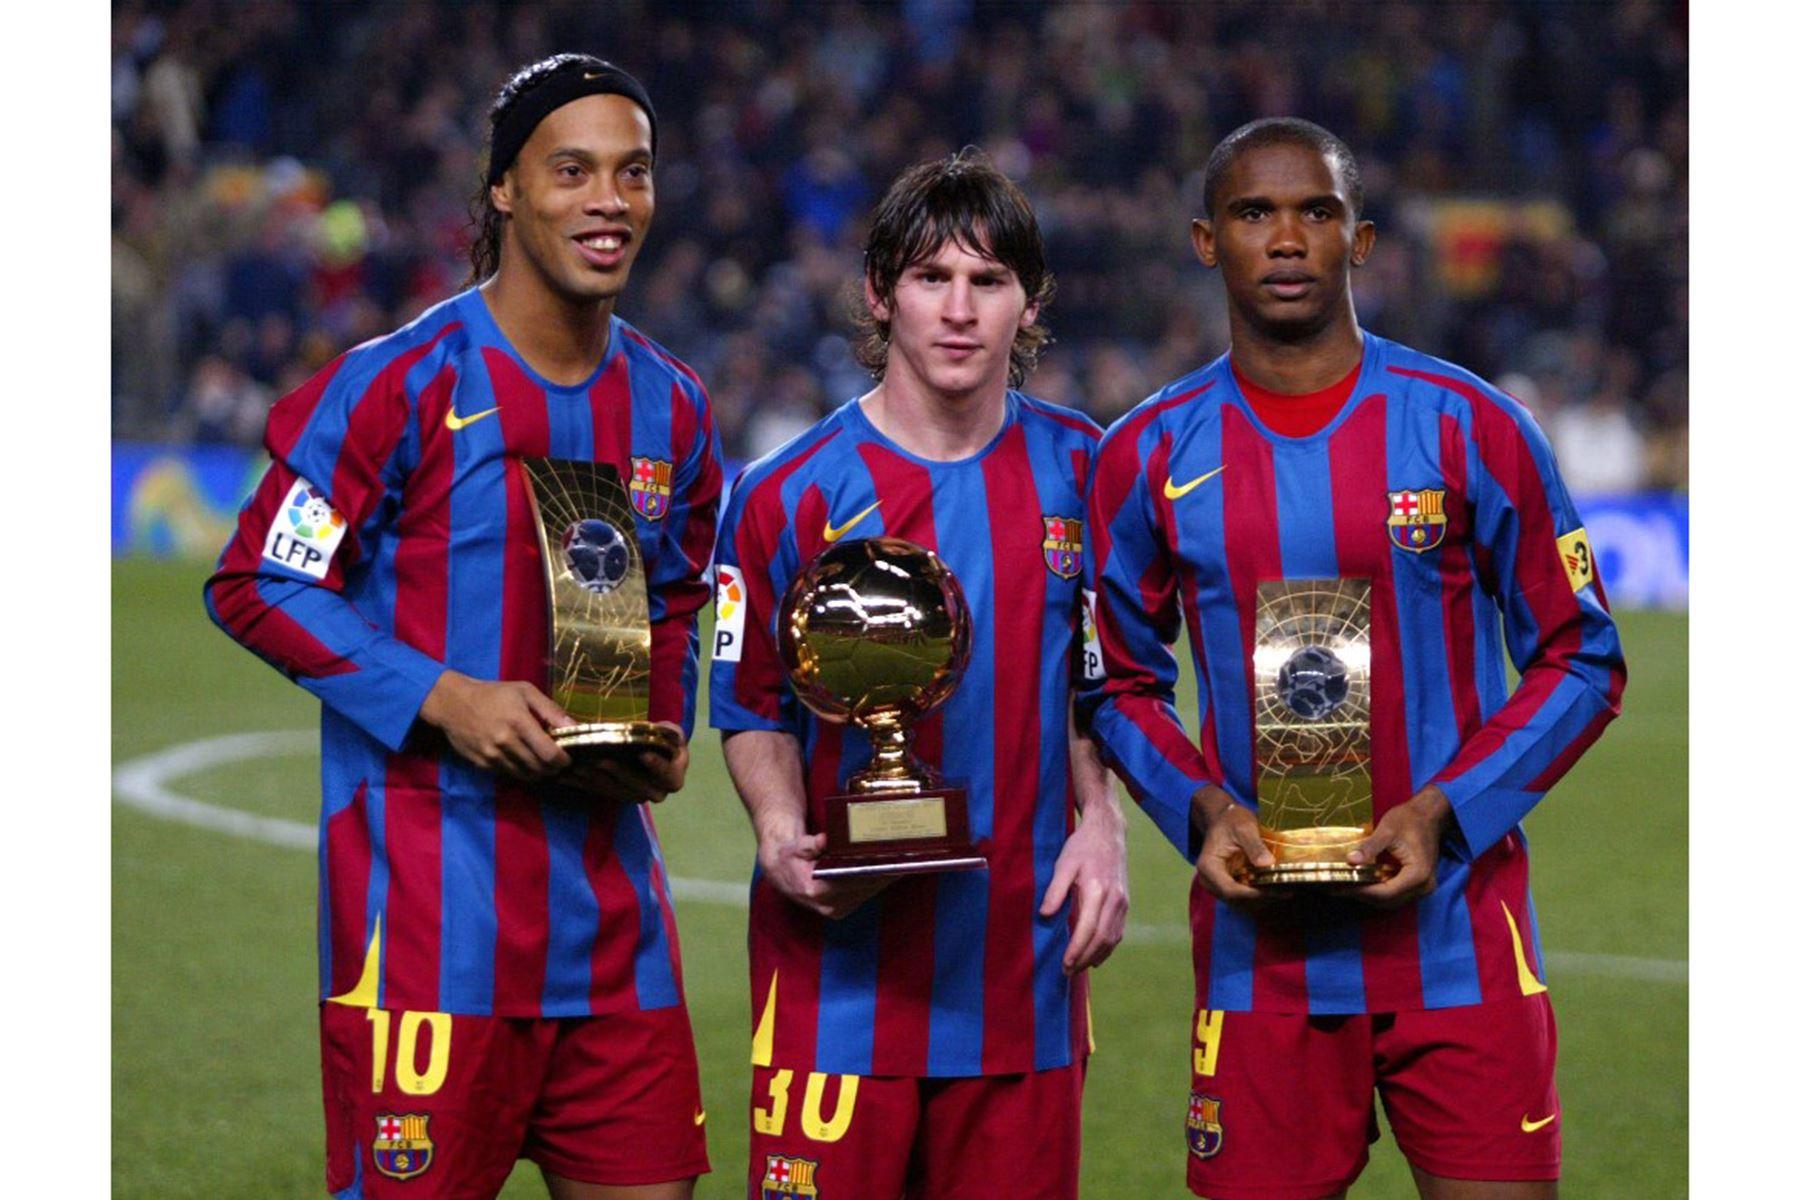 El brasileño Ronaldinho del FC Barcelona y Samuel Eto